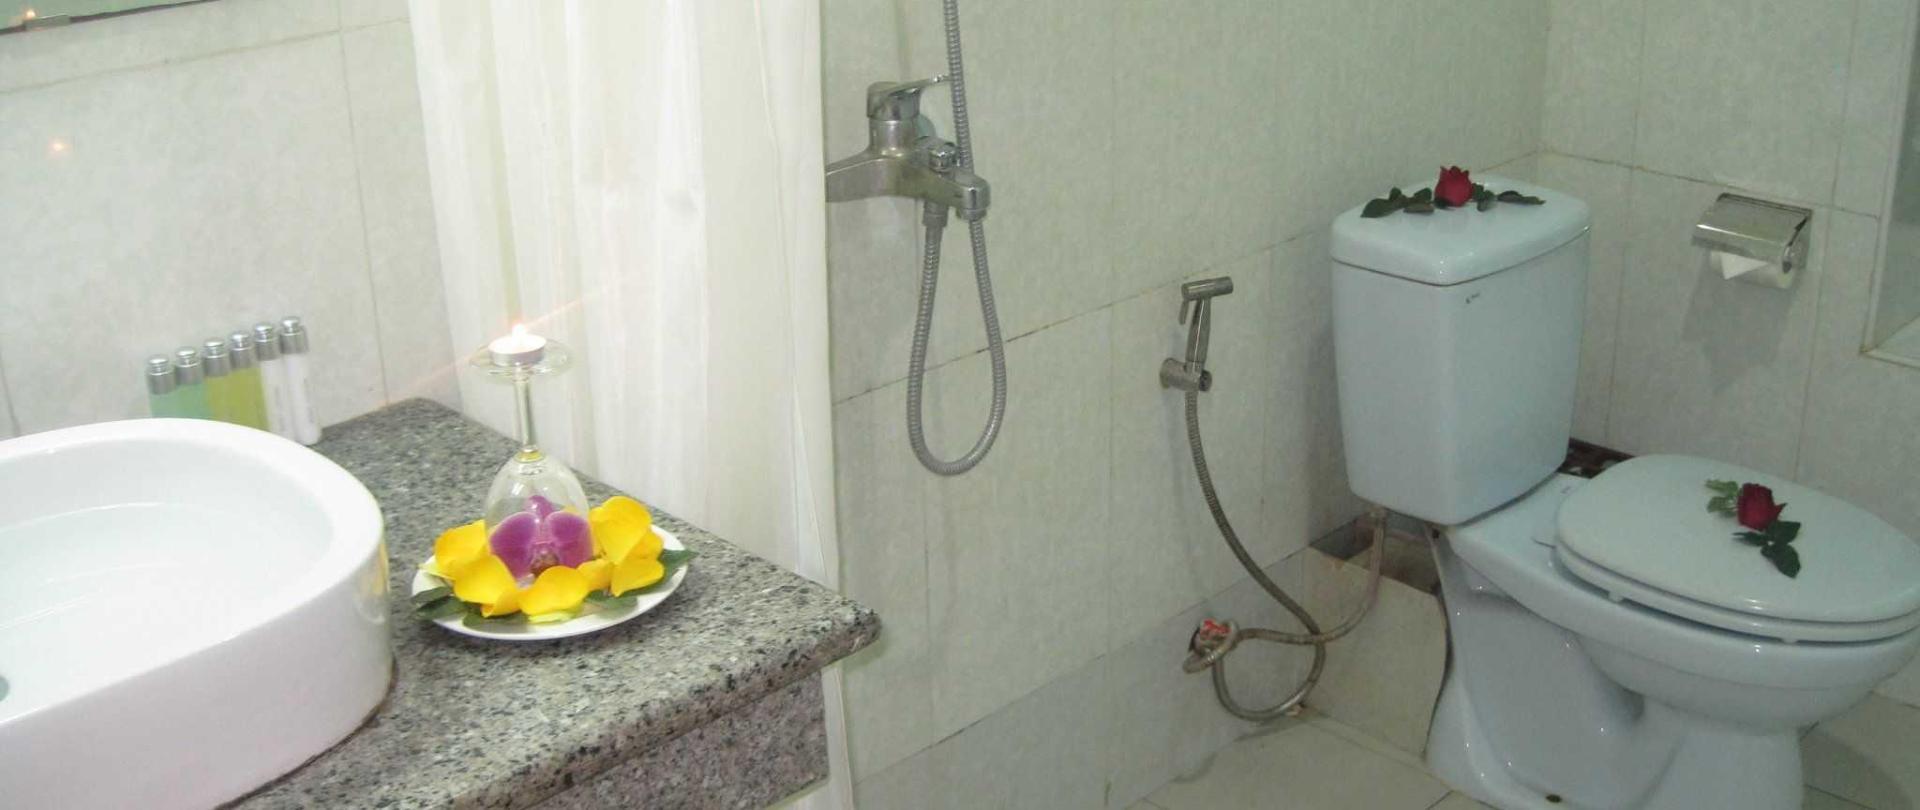 superior-toilet.JPG